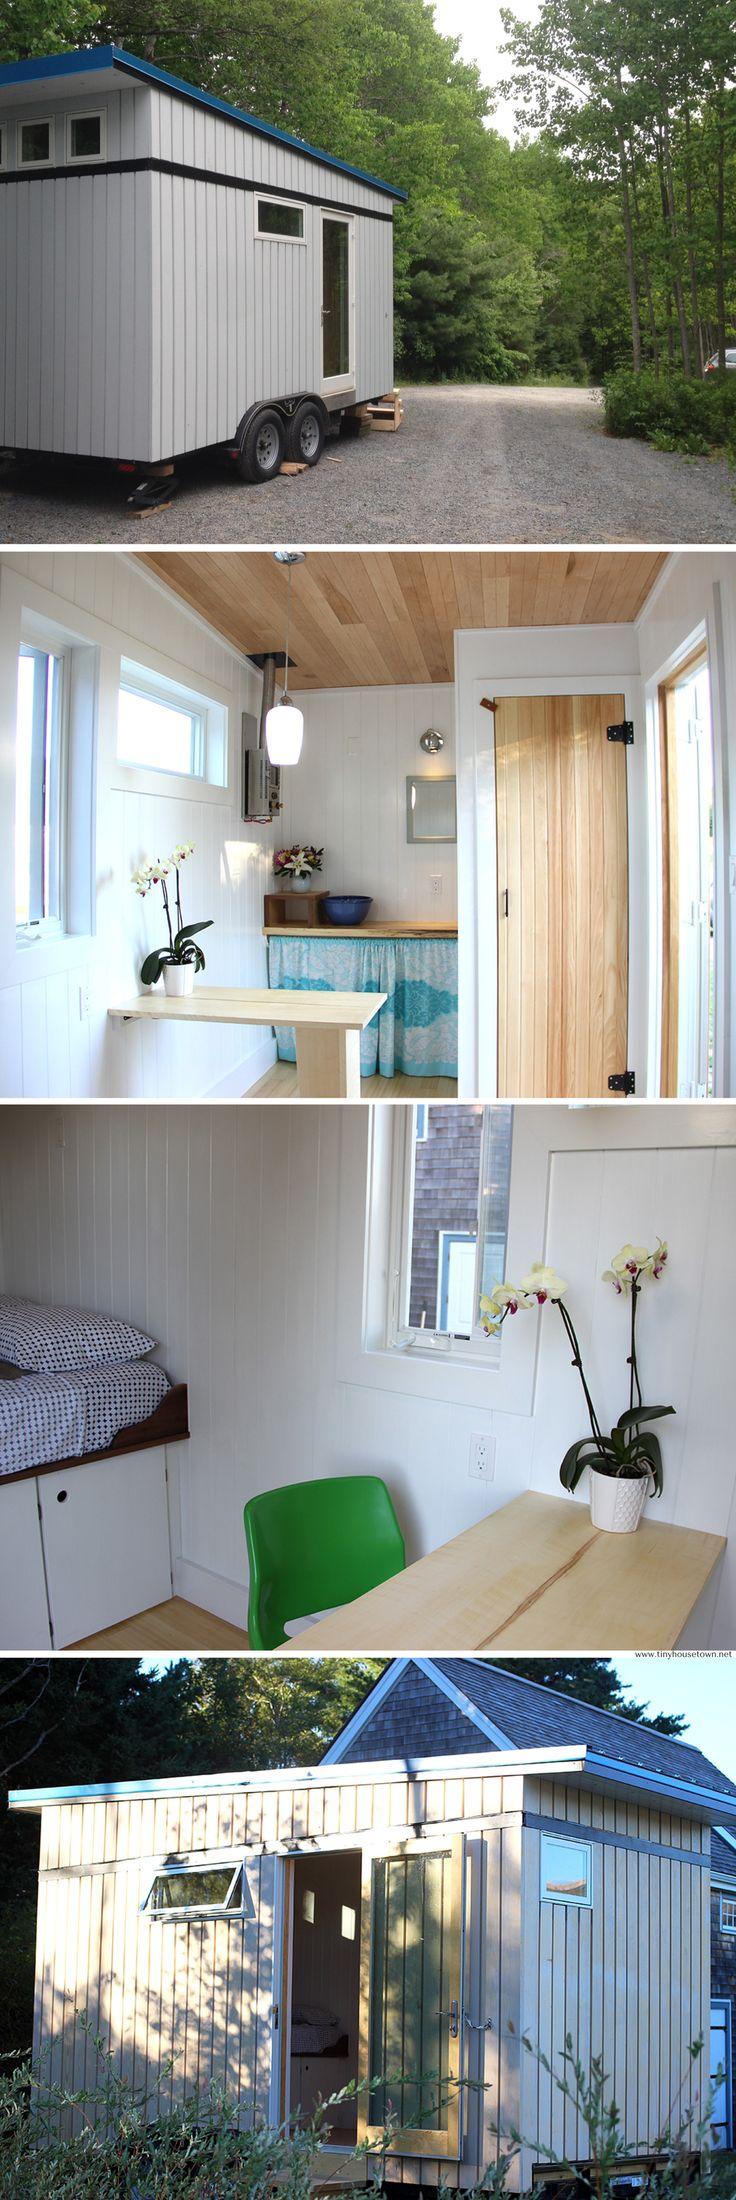 The Birdhouse from Full Moon Tiny Shelters